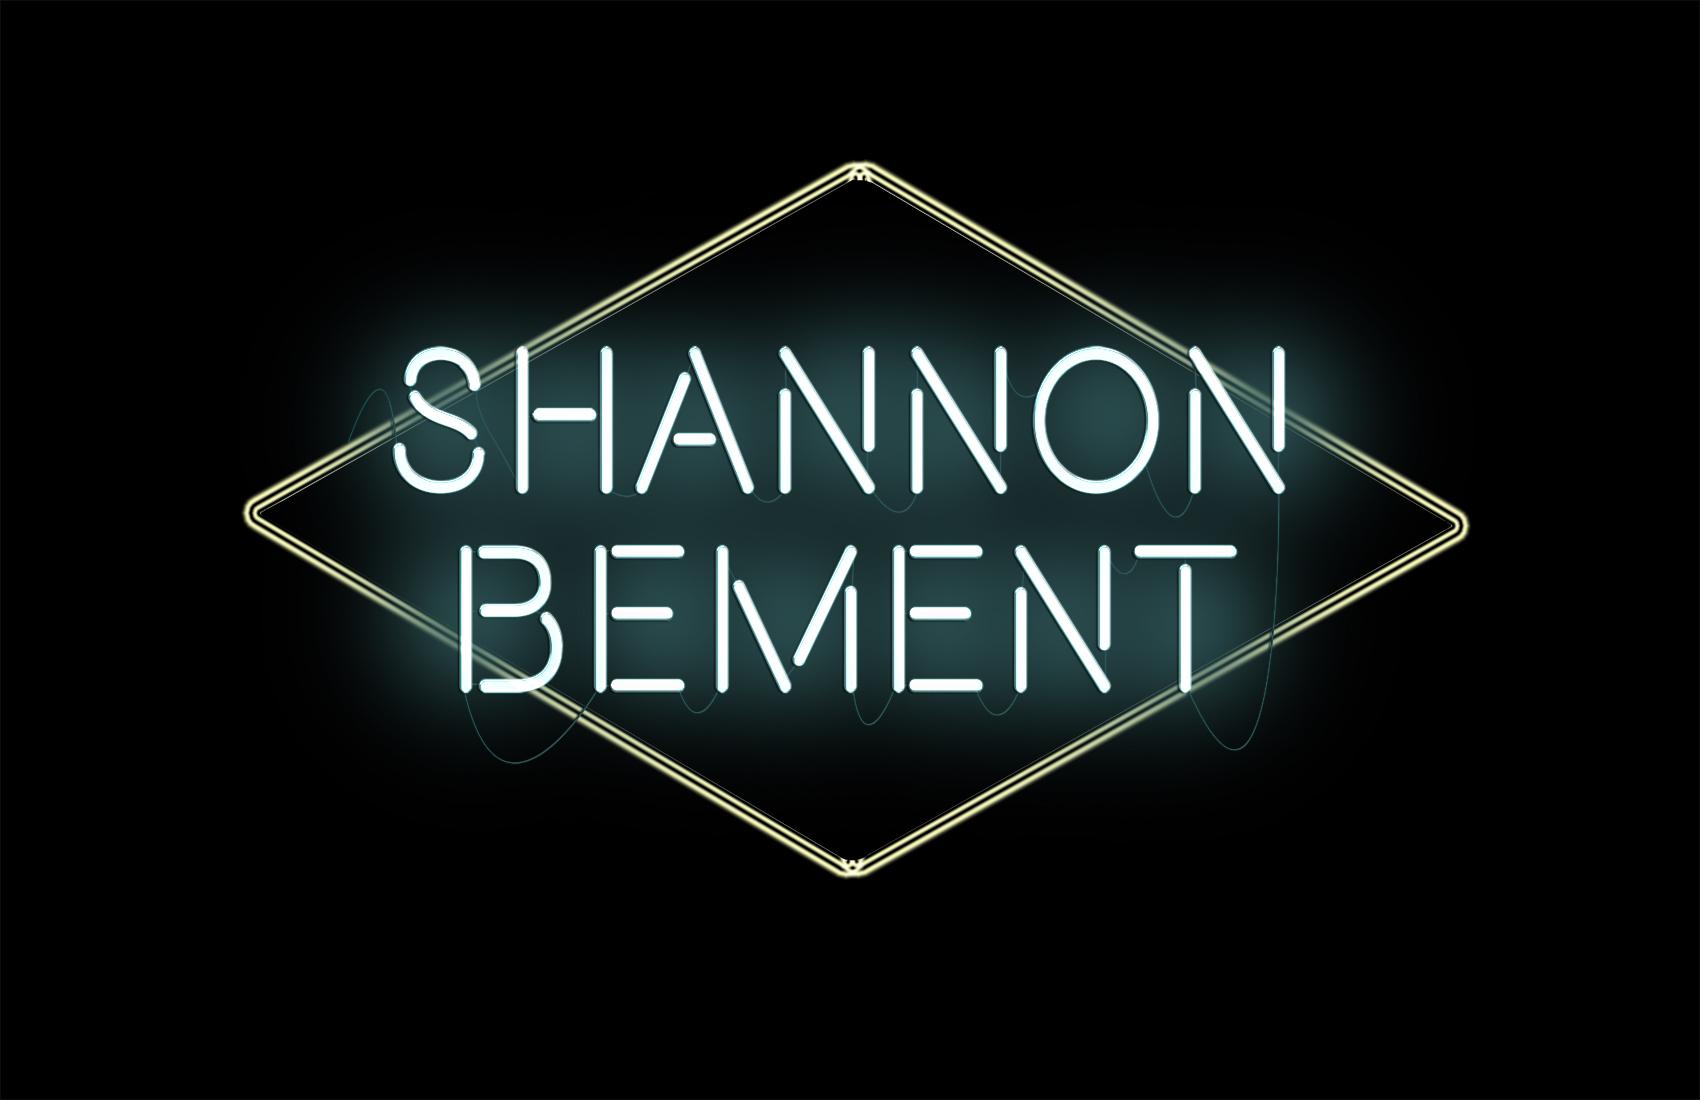 Shannon_logo.jpg